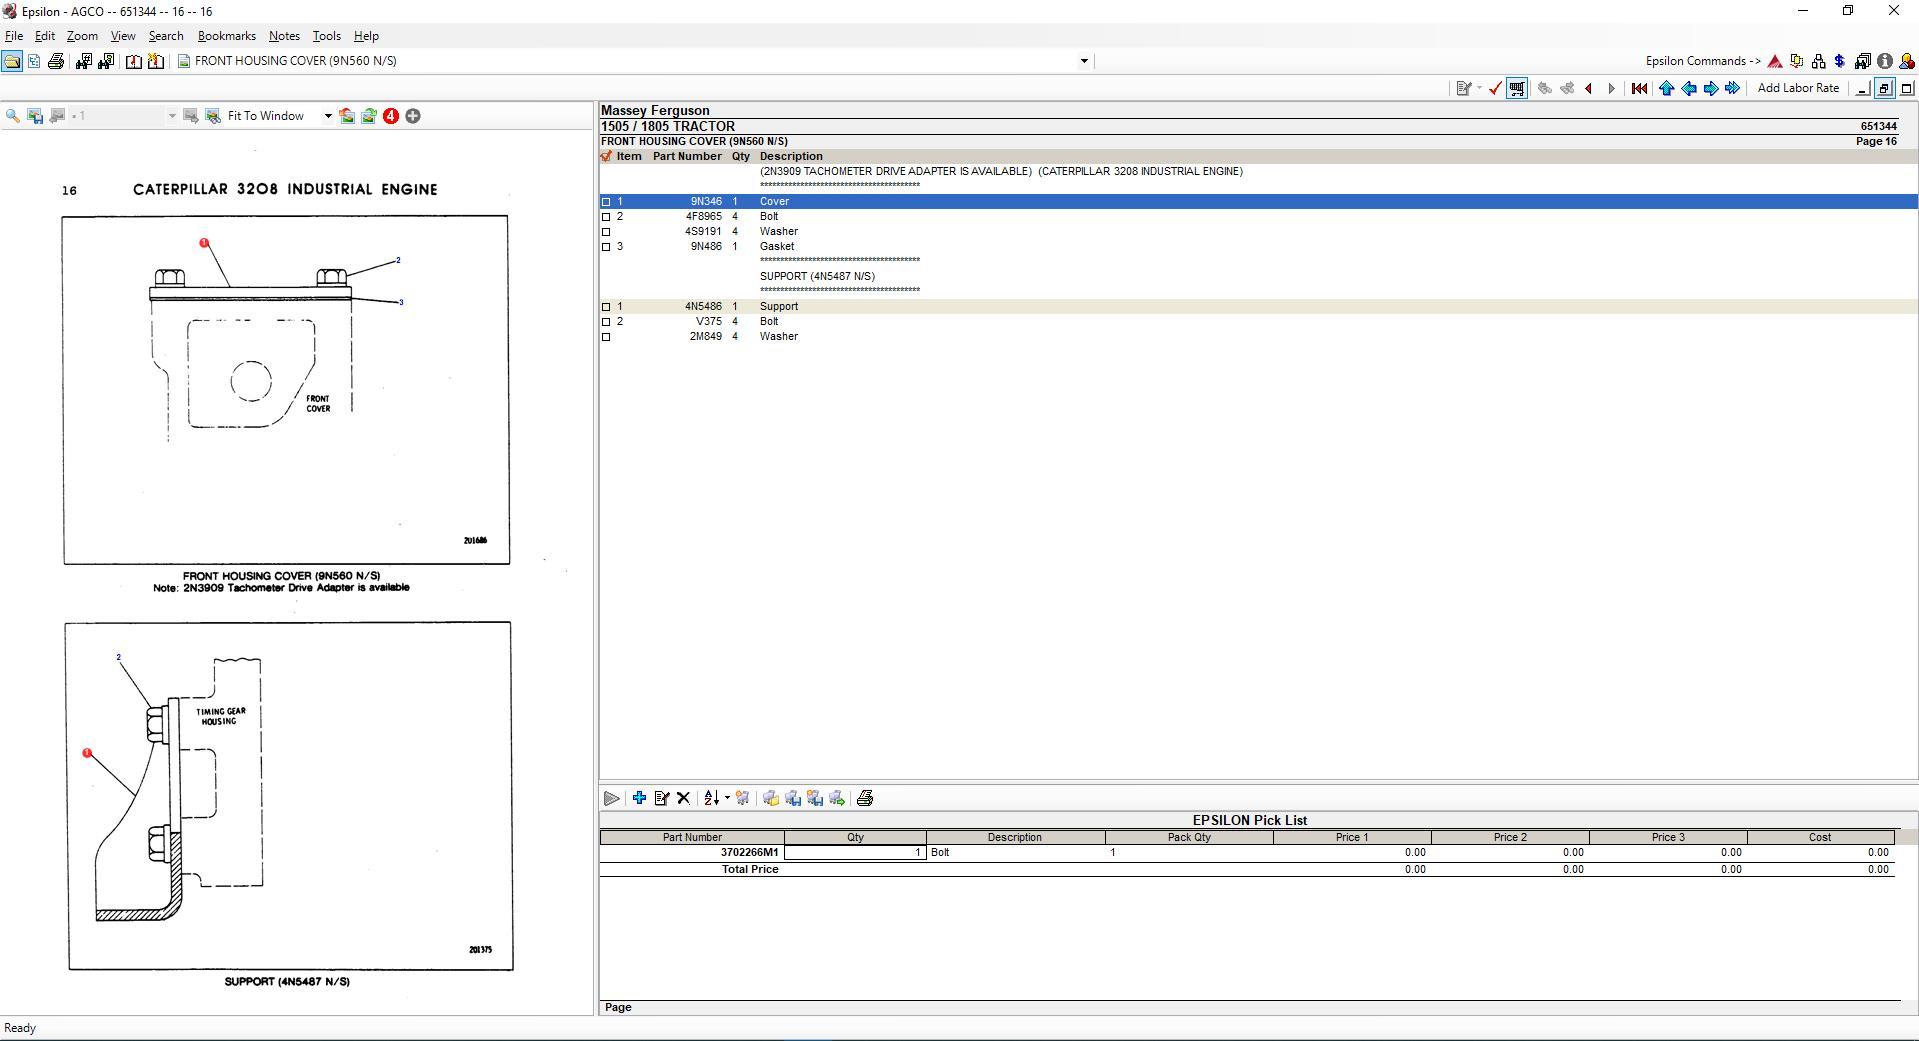 Massey_Ferguson_AG_Europe_Parts_Catalog_Workshop_Service_Manuals_2020_12